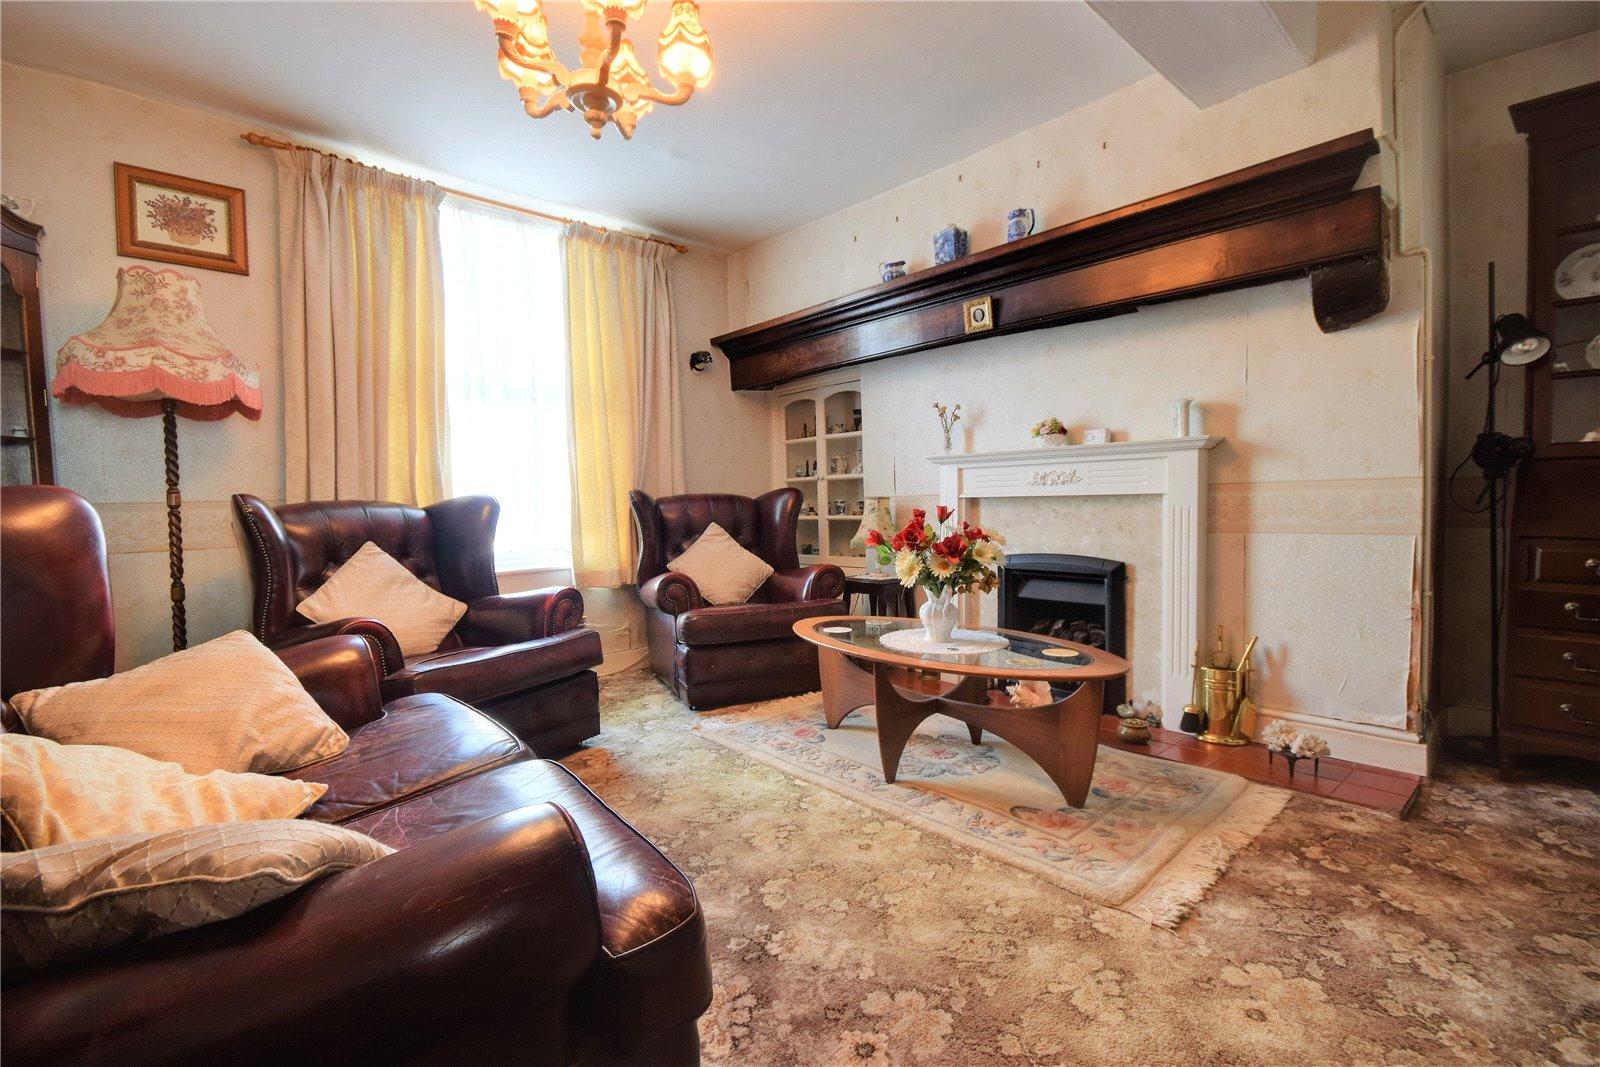 23 Salop Street, Bridgnorth, Shropshire, WV16